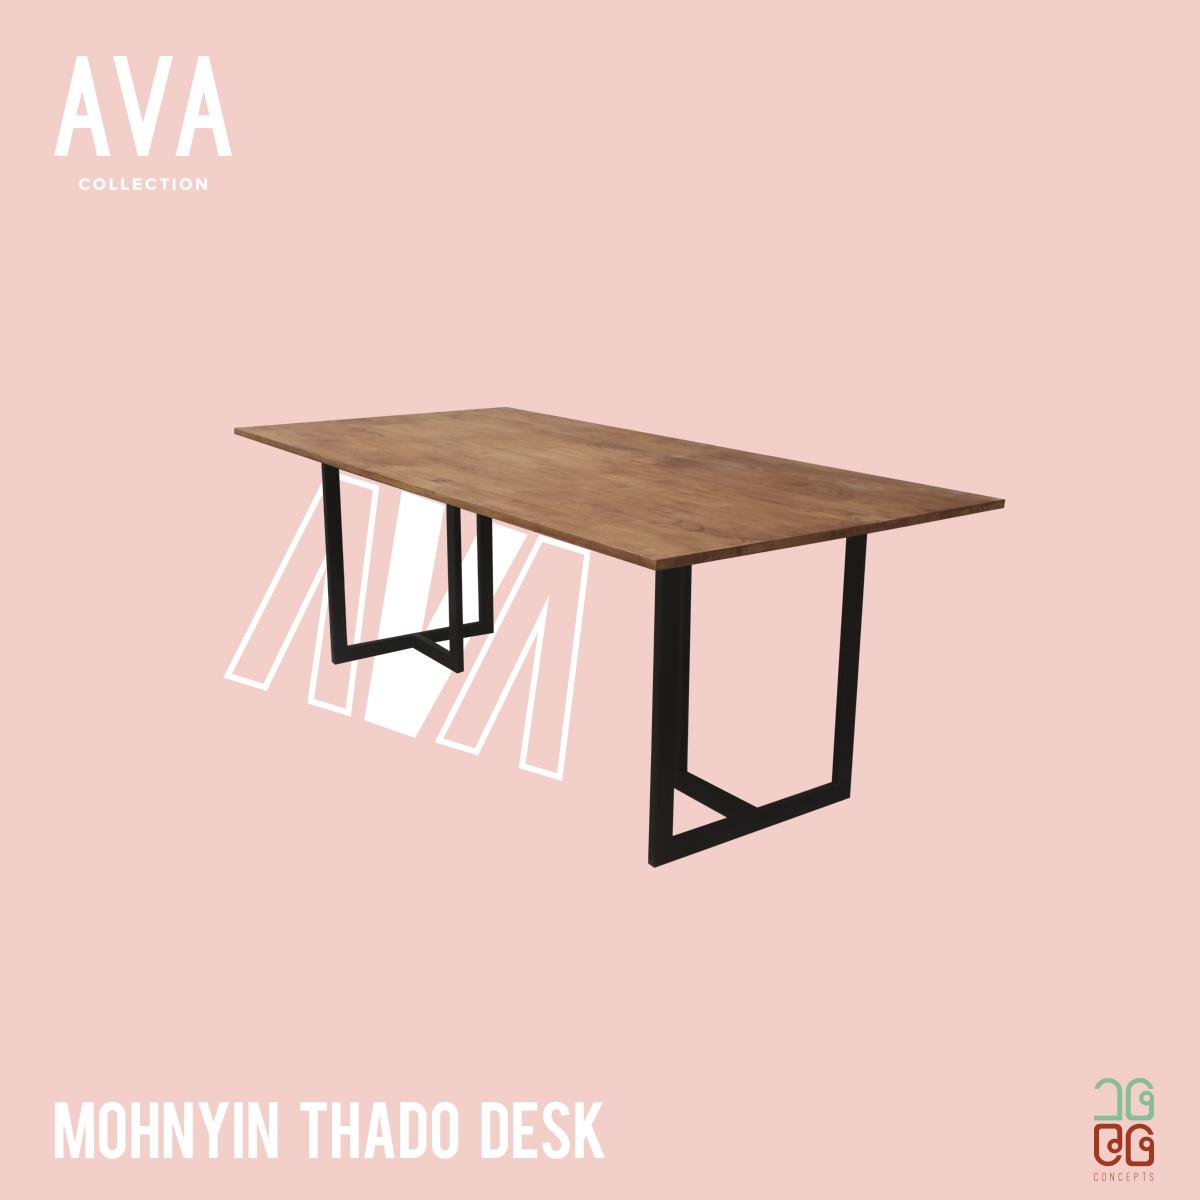 FB_MohnyinThado Desk1.jpg